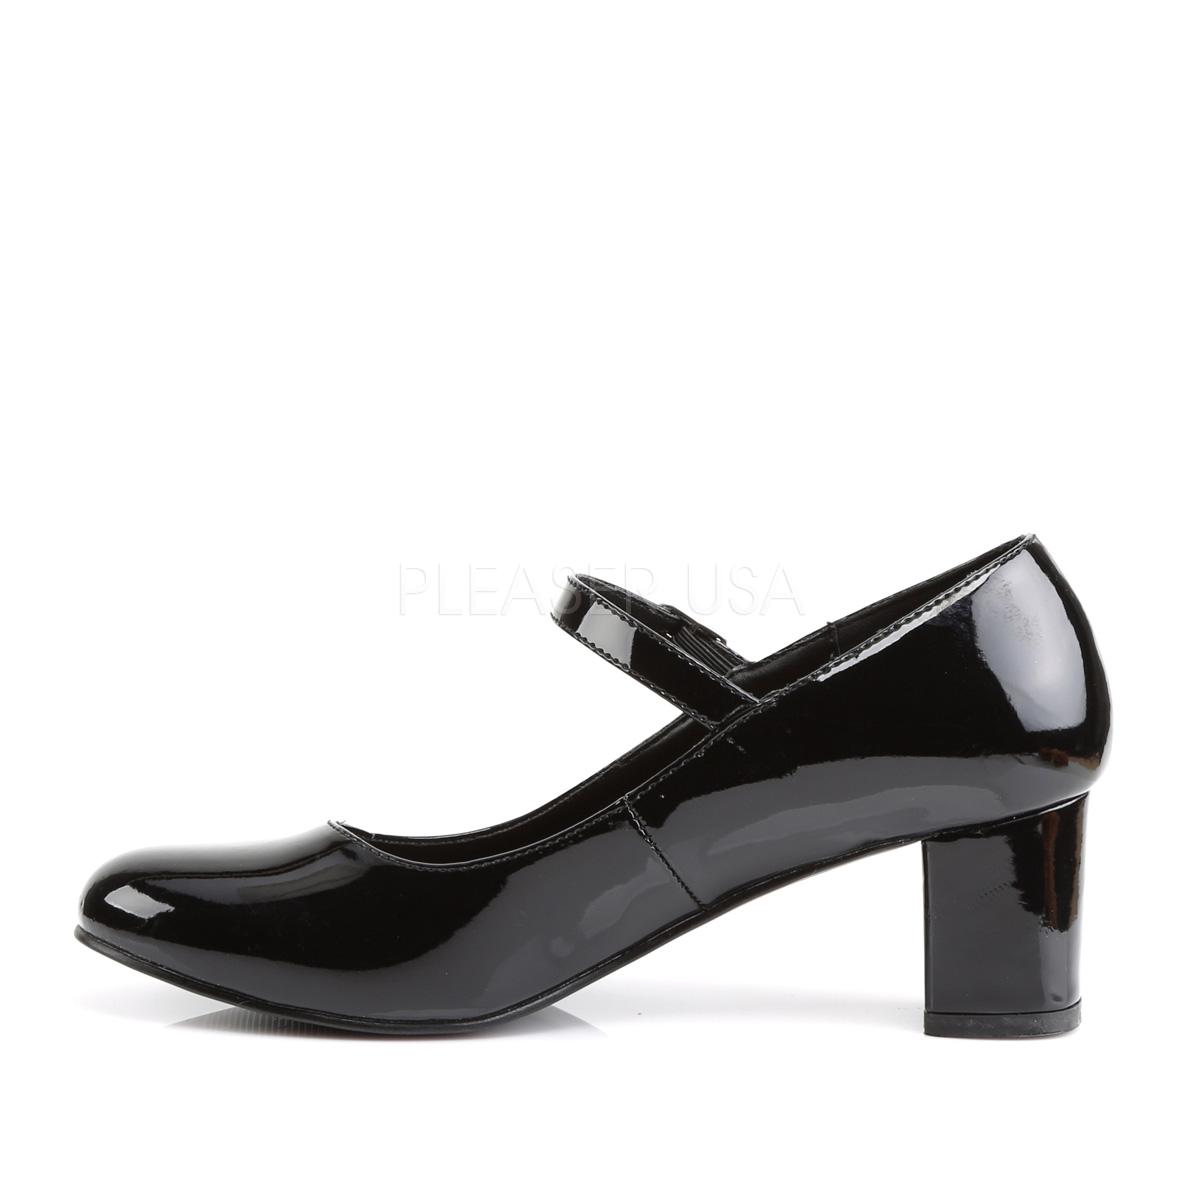 Funtasma SCHOOLGIRL-50 2inch Heel Plain Mary Jane Schoolgirl Retro Shoe◆取り寄せ